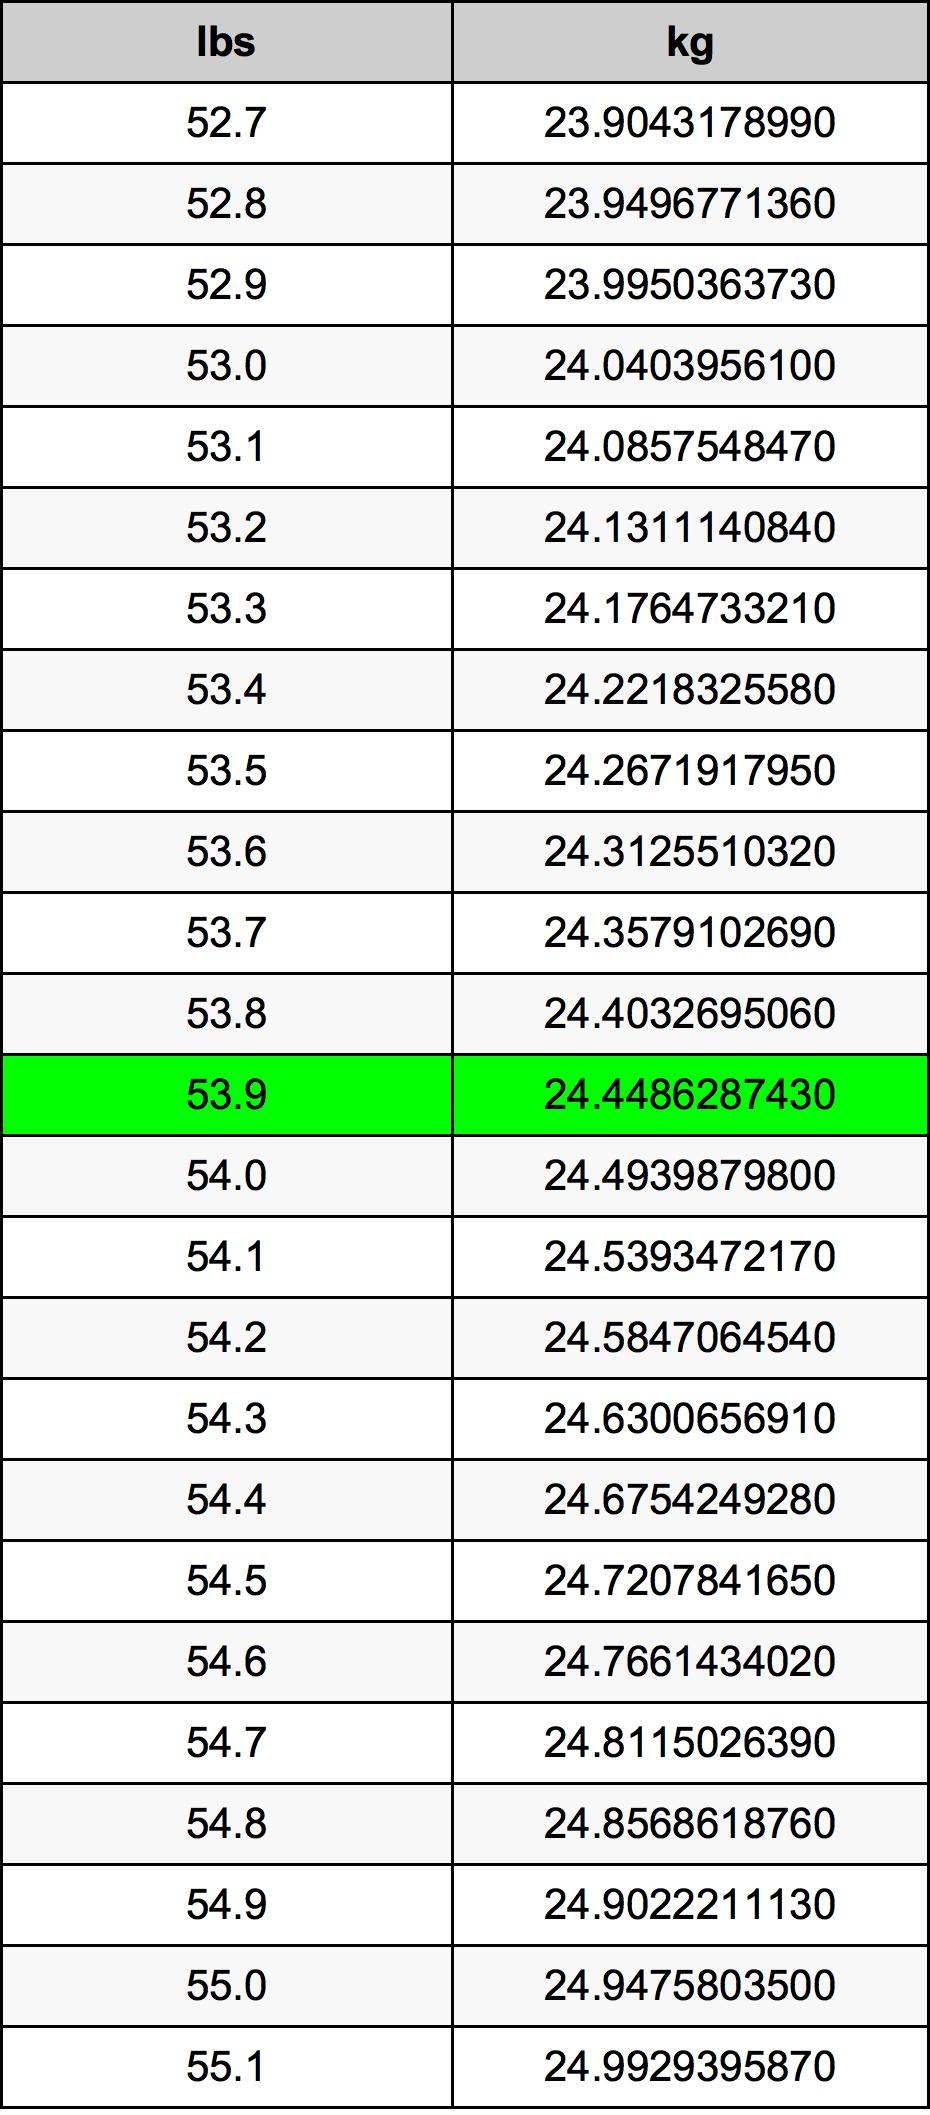 53.9 Libra konverteringstabellen